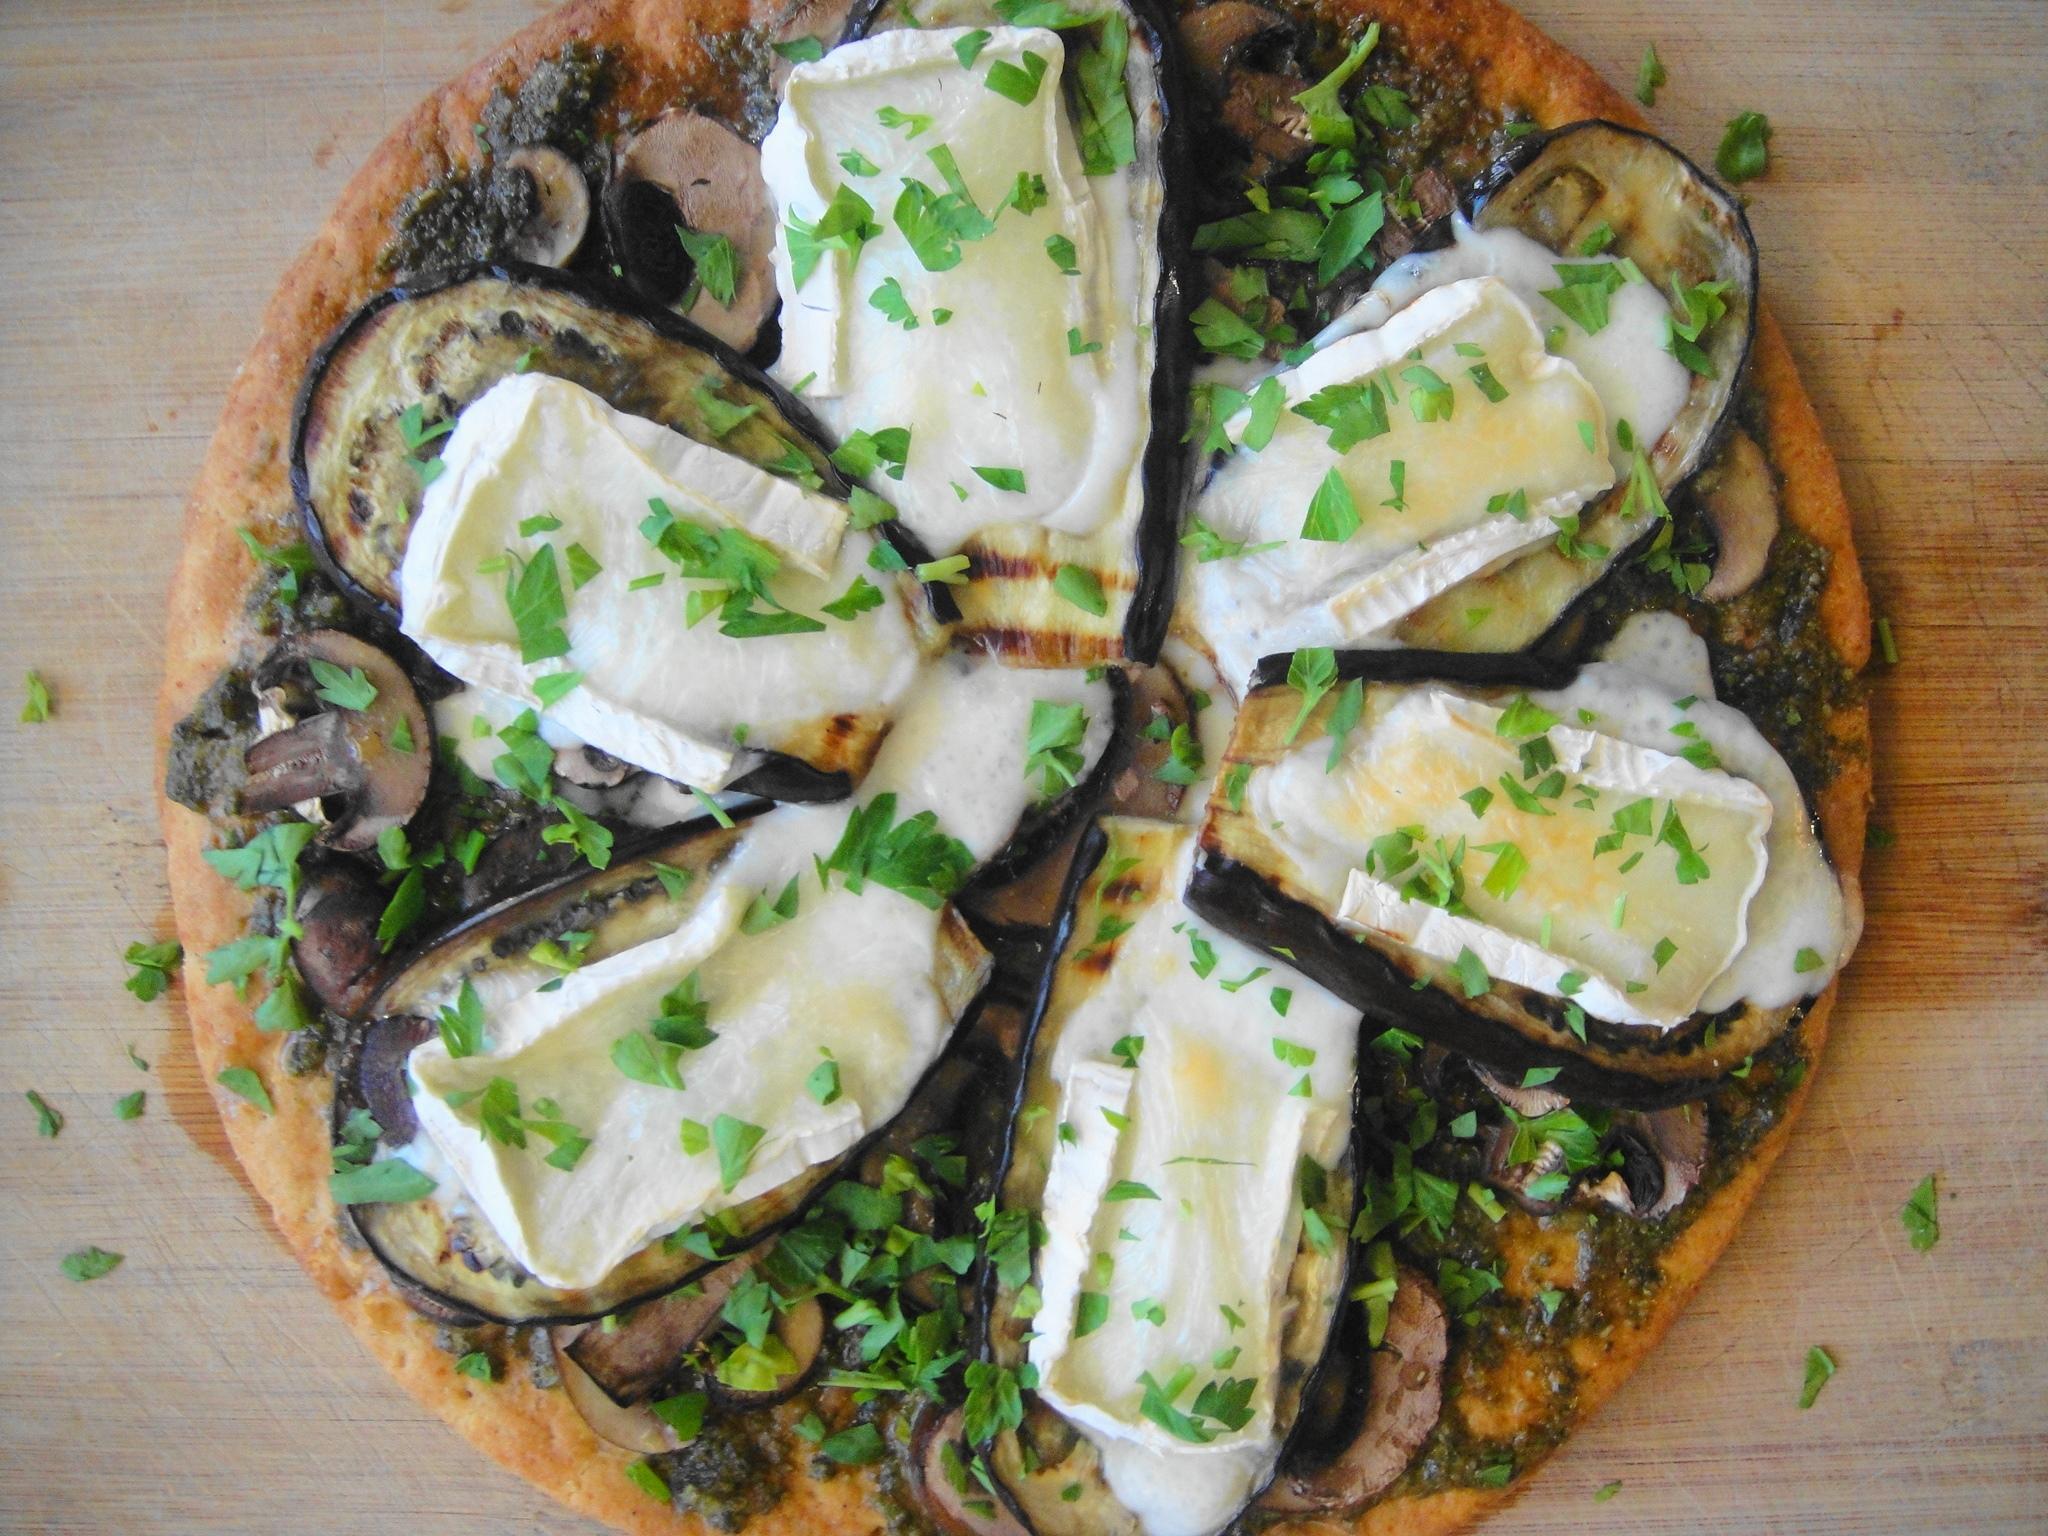 Pesto Eggplant Brie Pizza with Truffle Oil